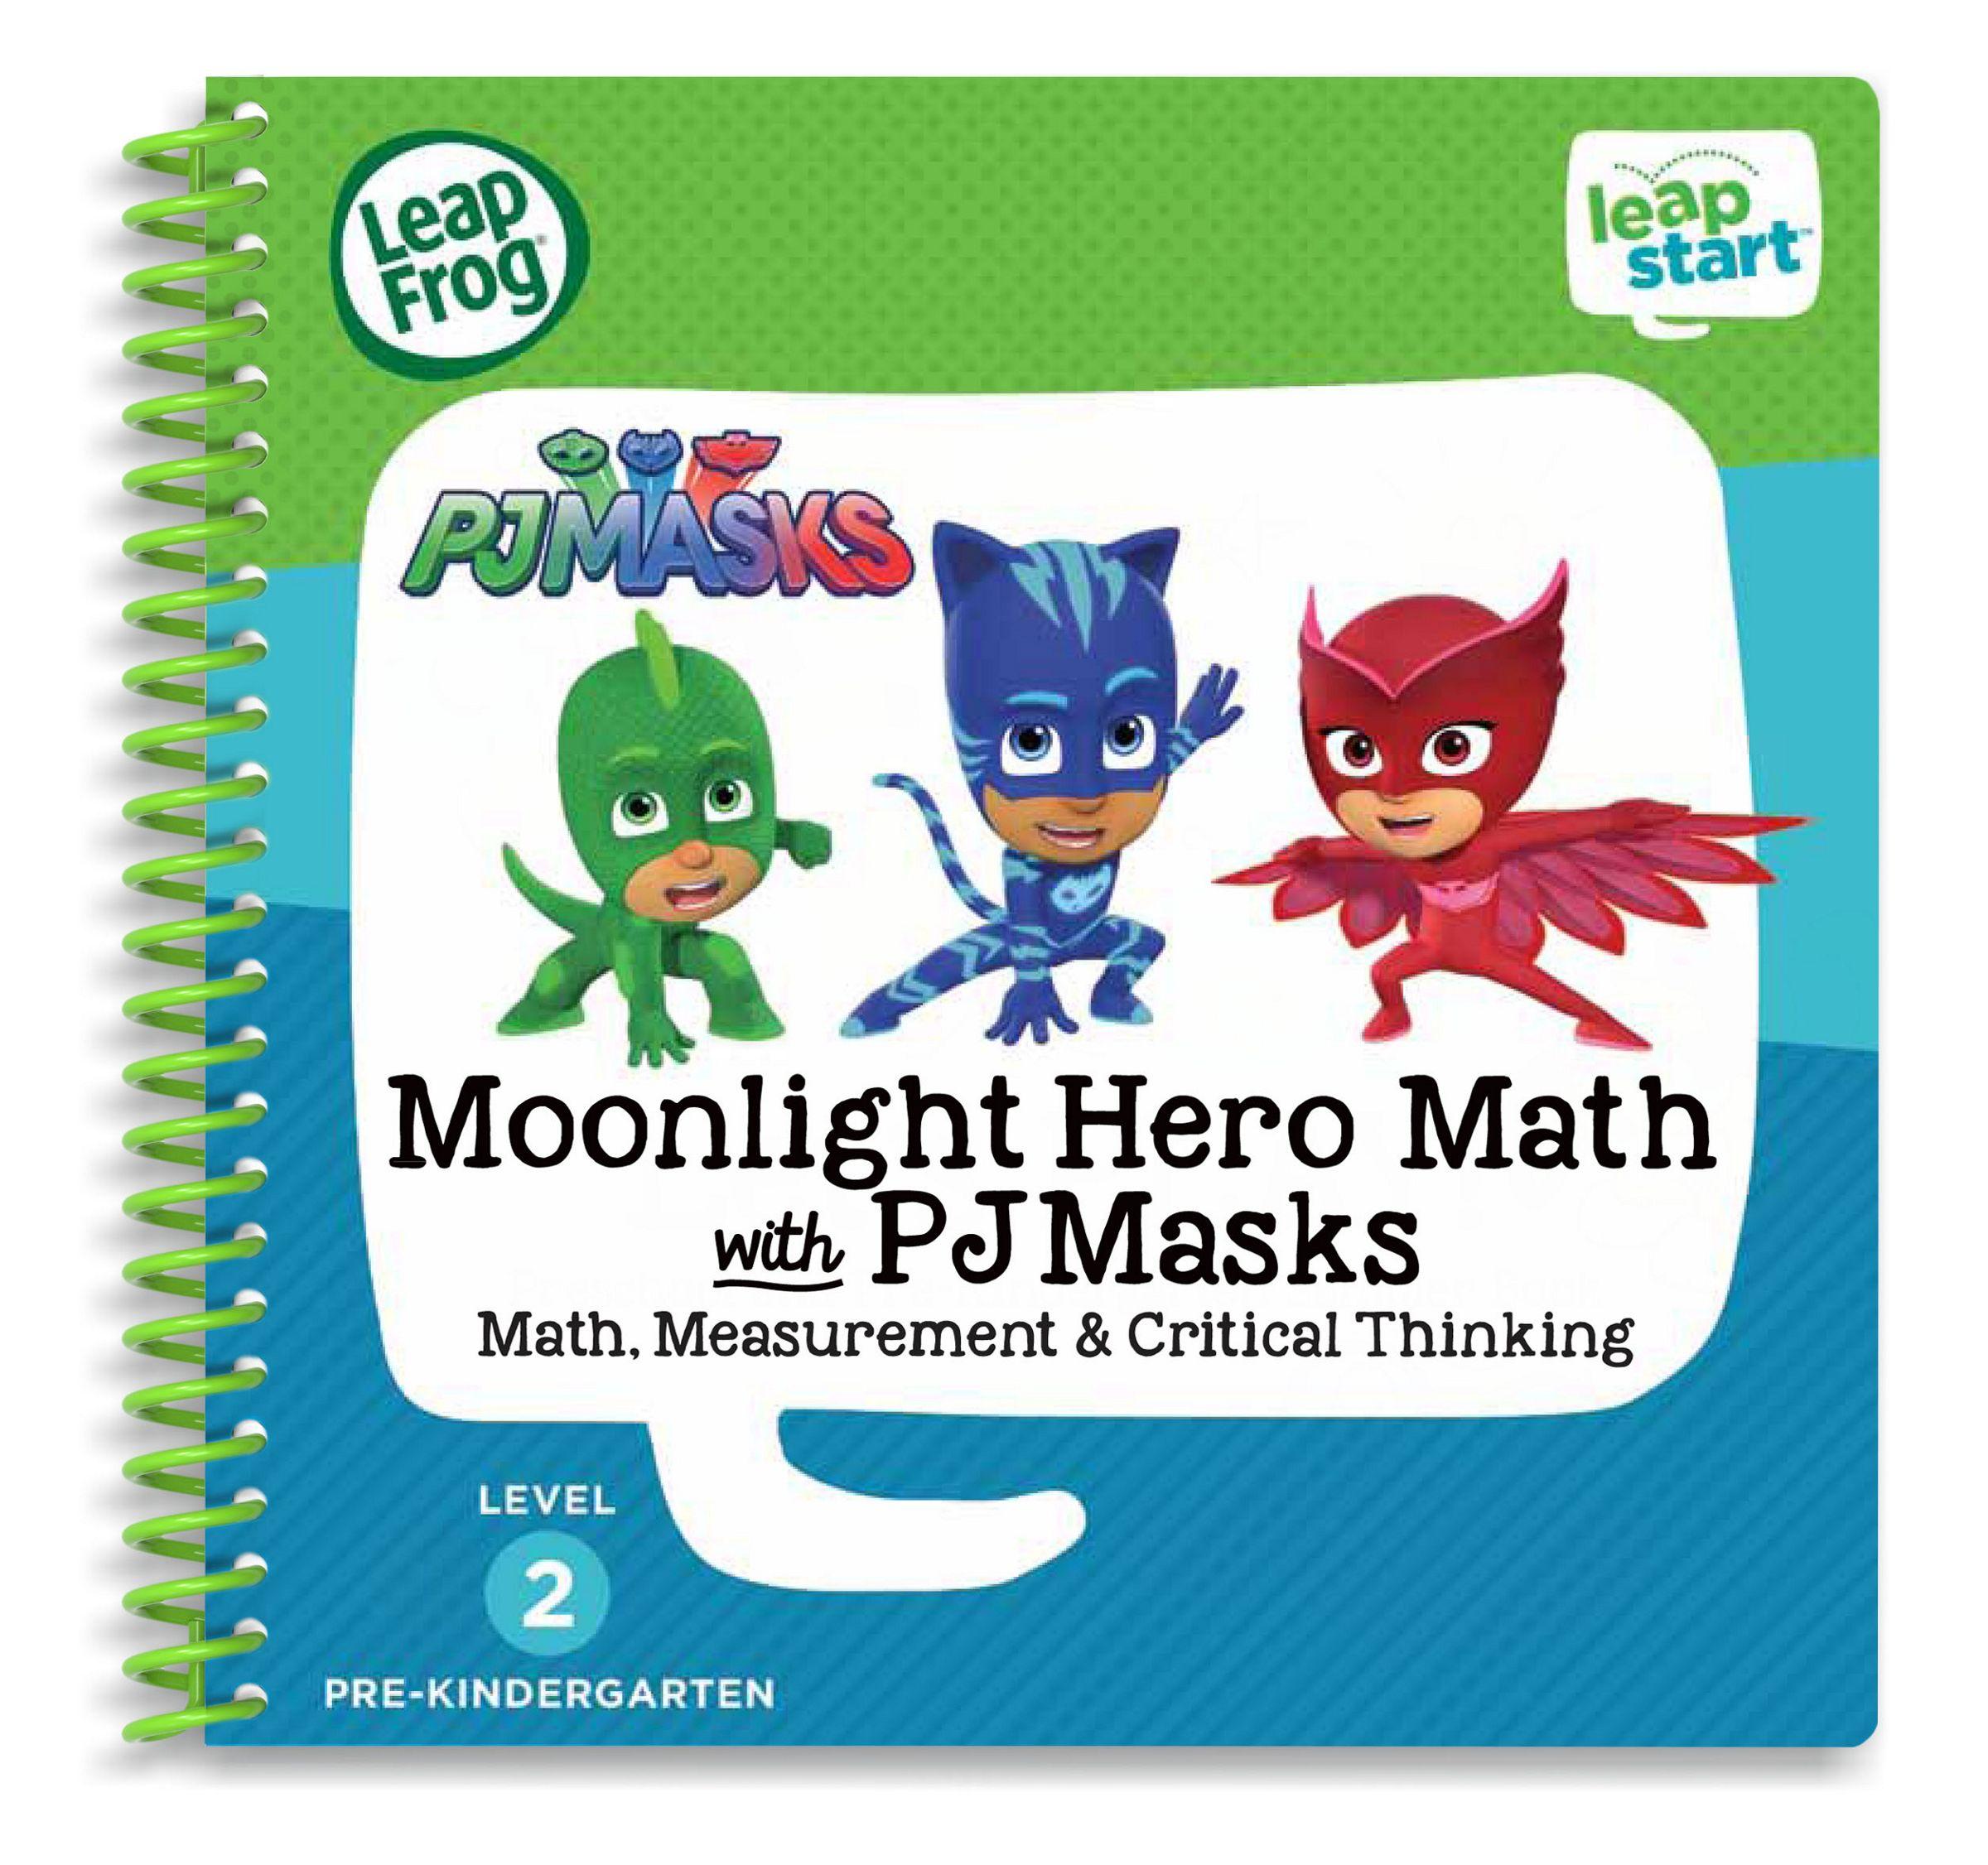 Moonlight Hero Math with PJ Masks